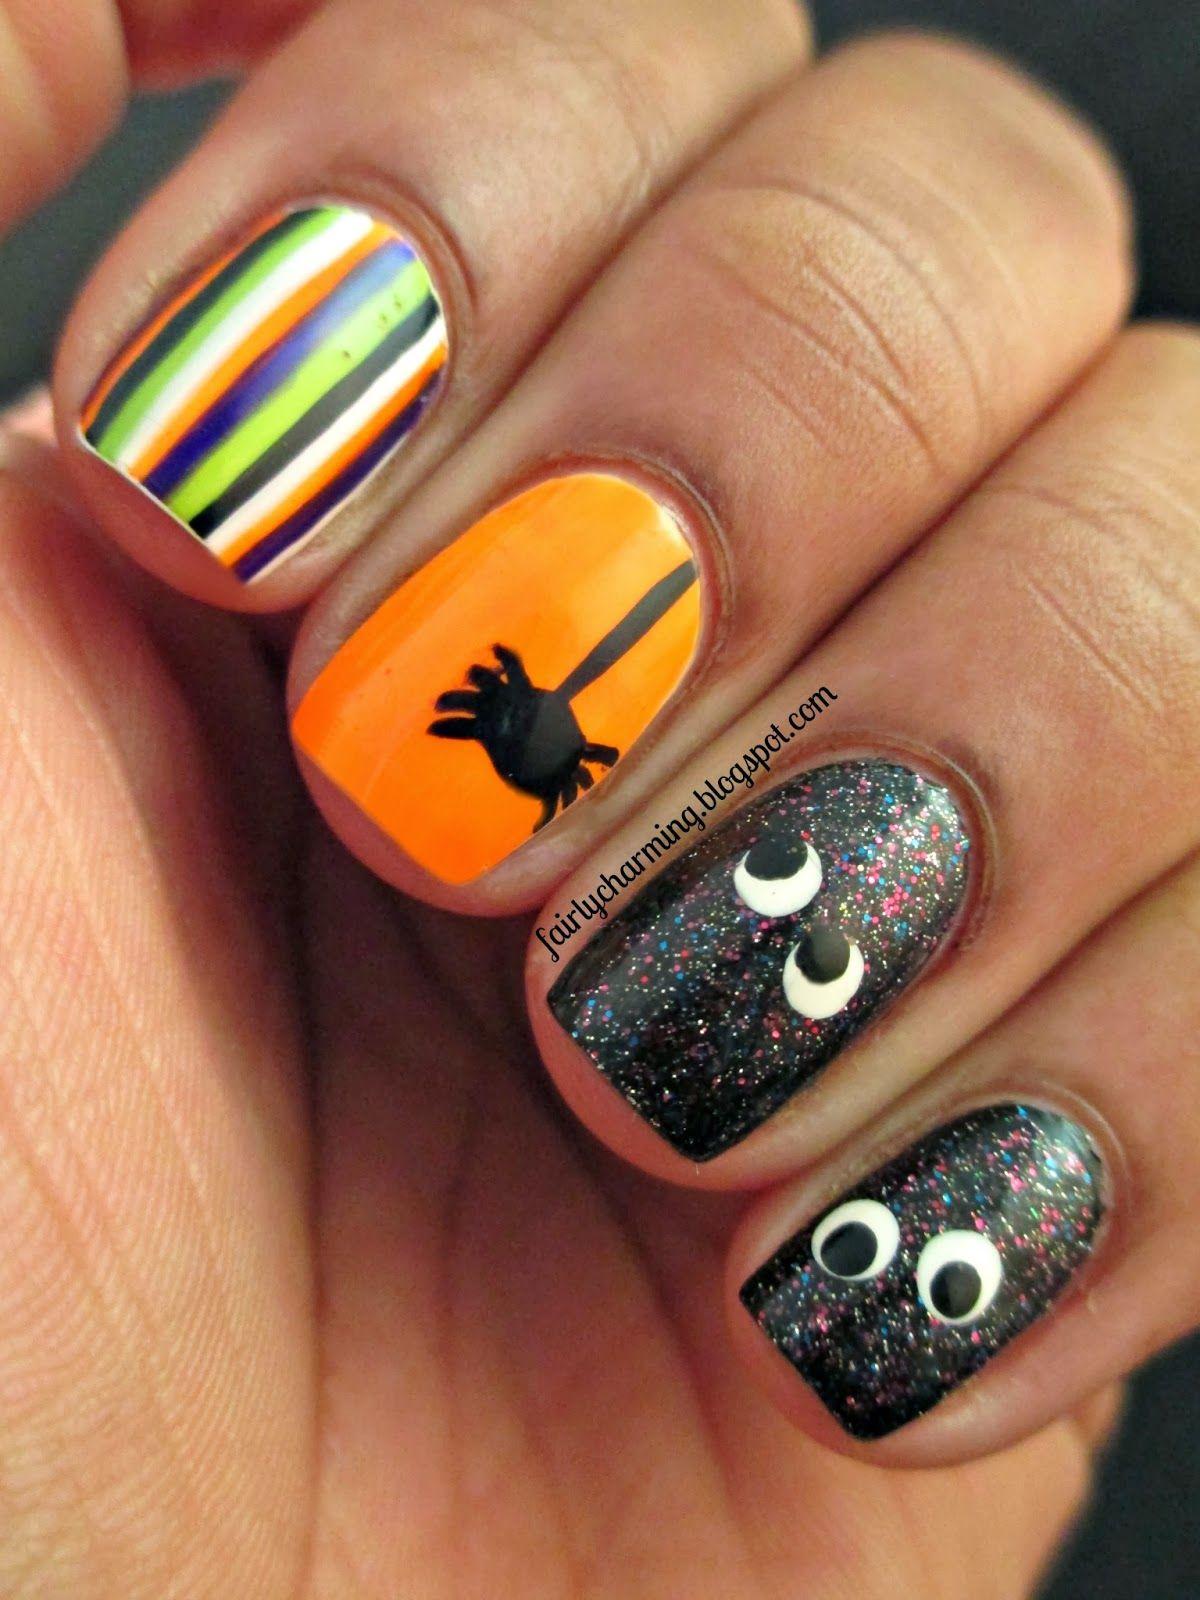 Nail3340g 12001600 Fingernail Art Pinterest Fun Nails